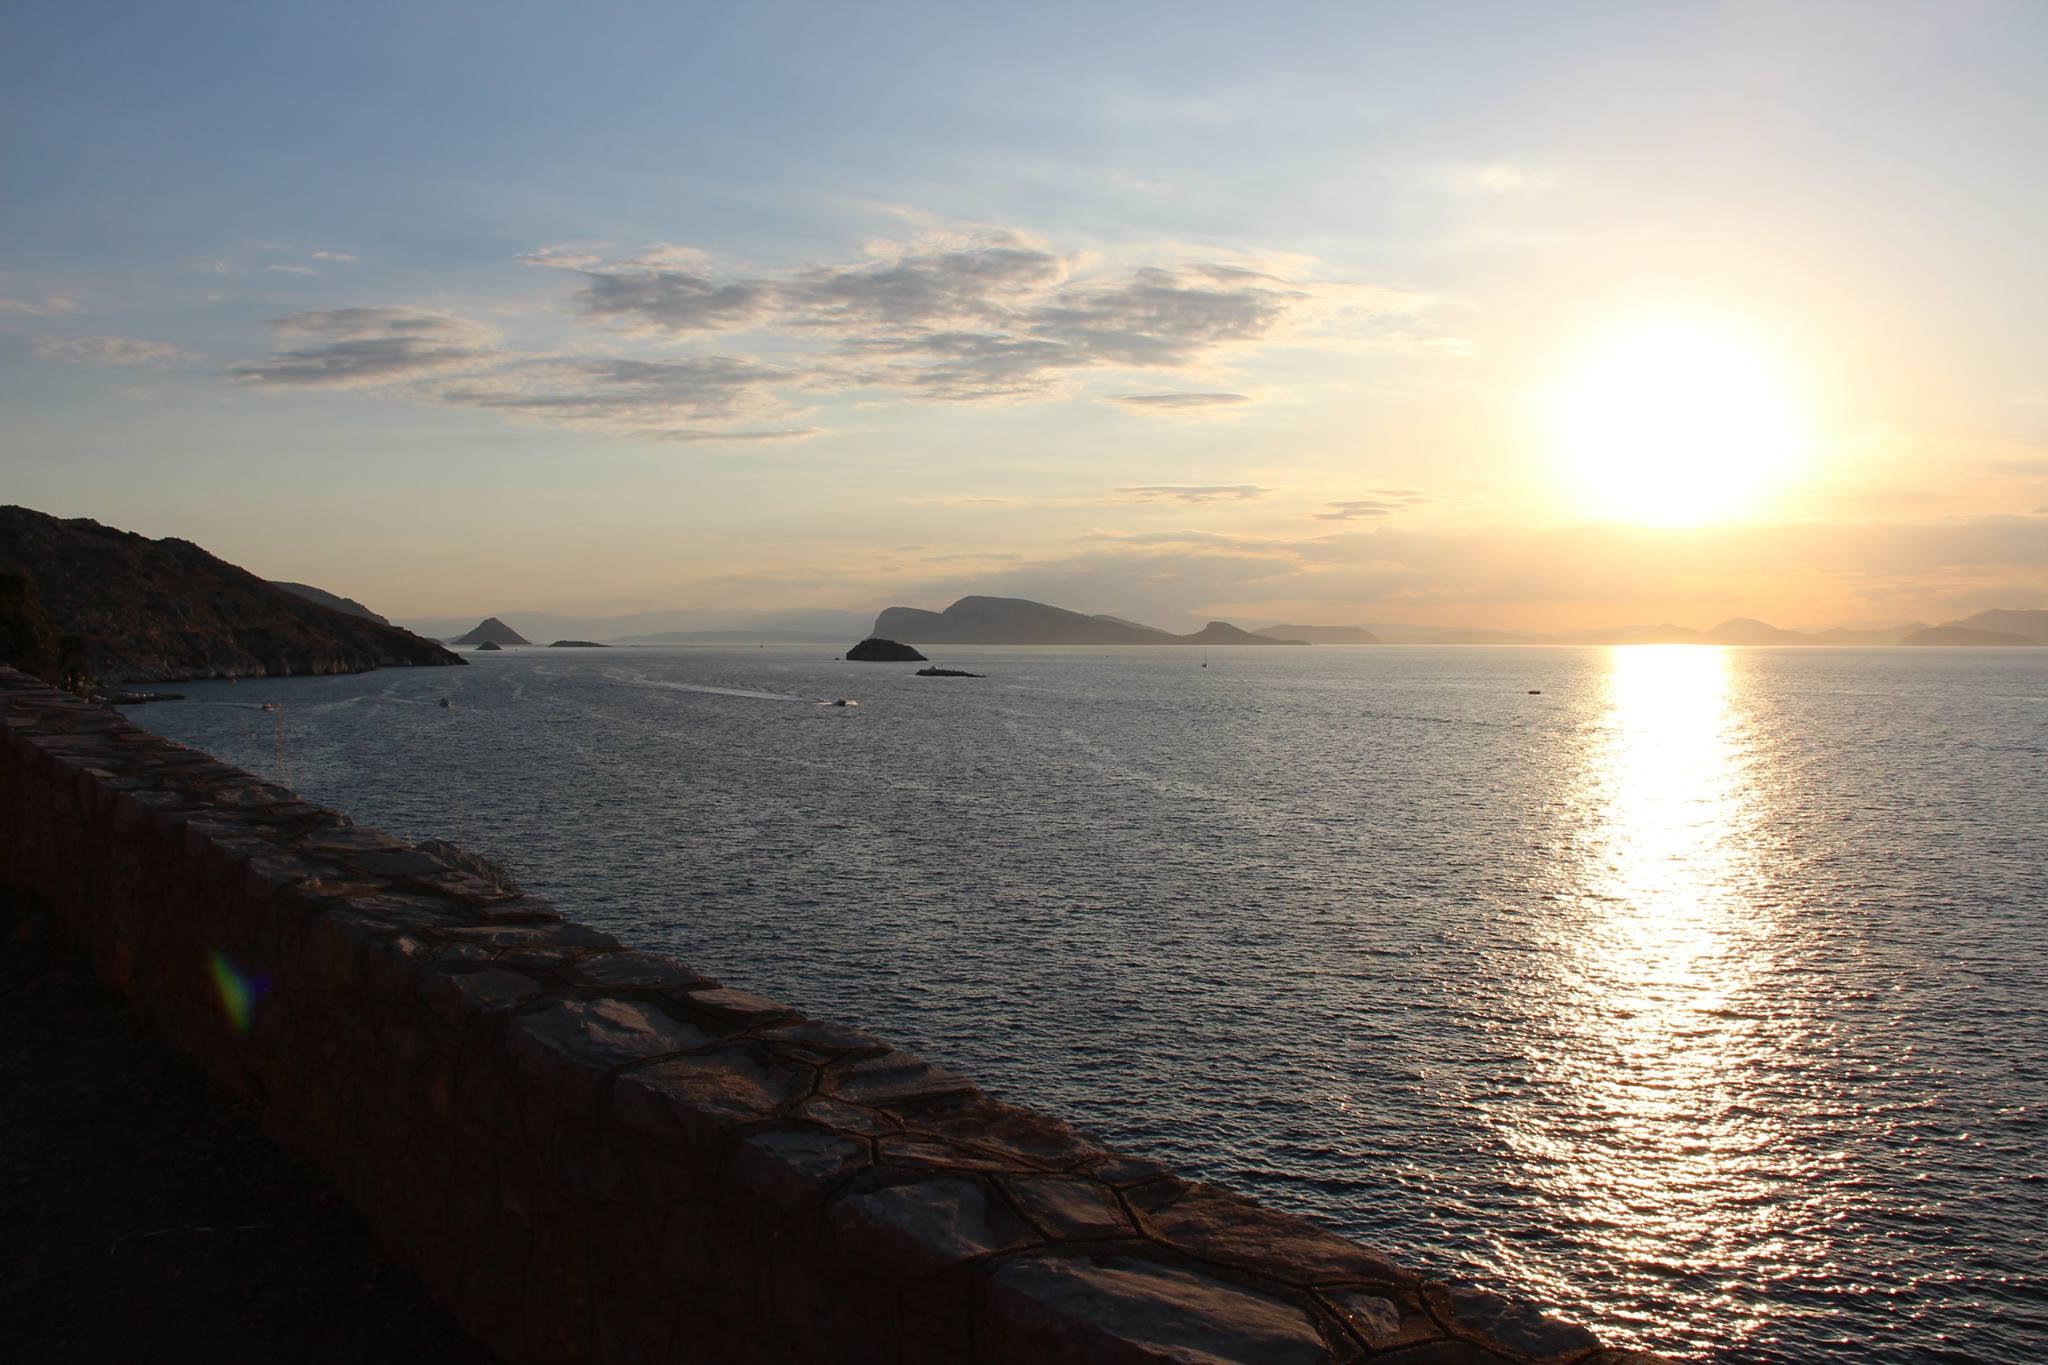 Путешествие на яхте по Греческим островам 2015